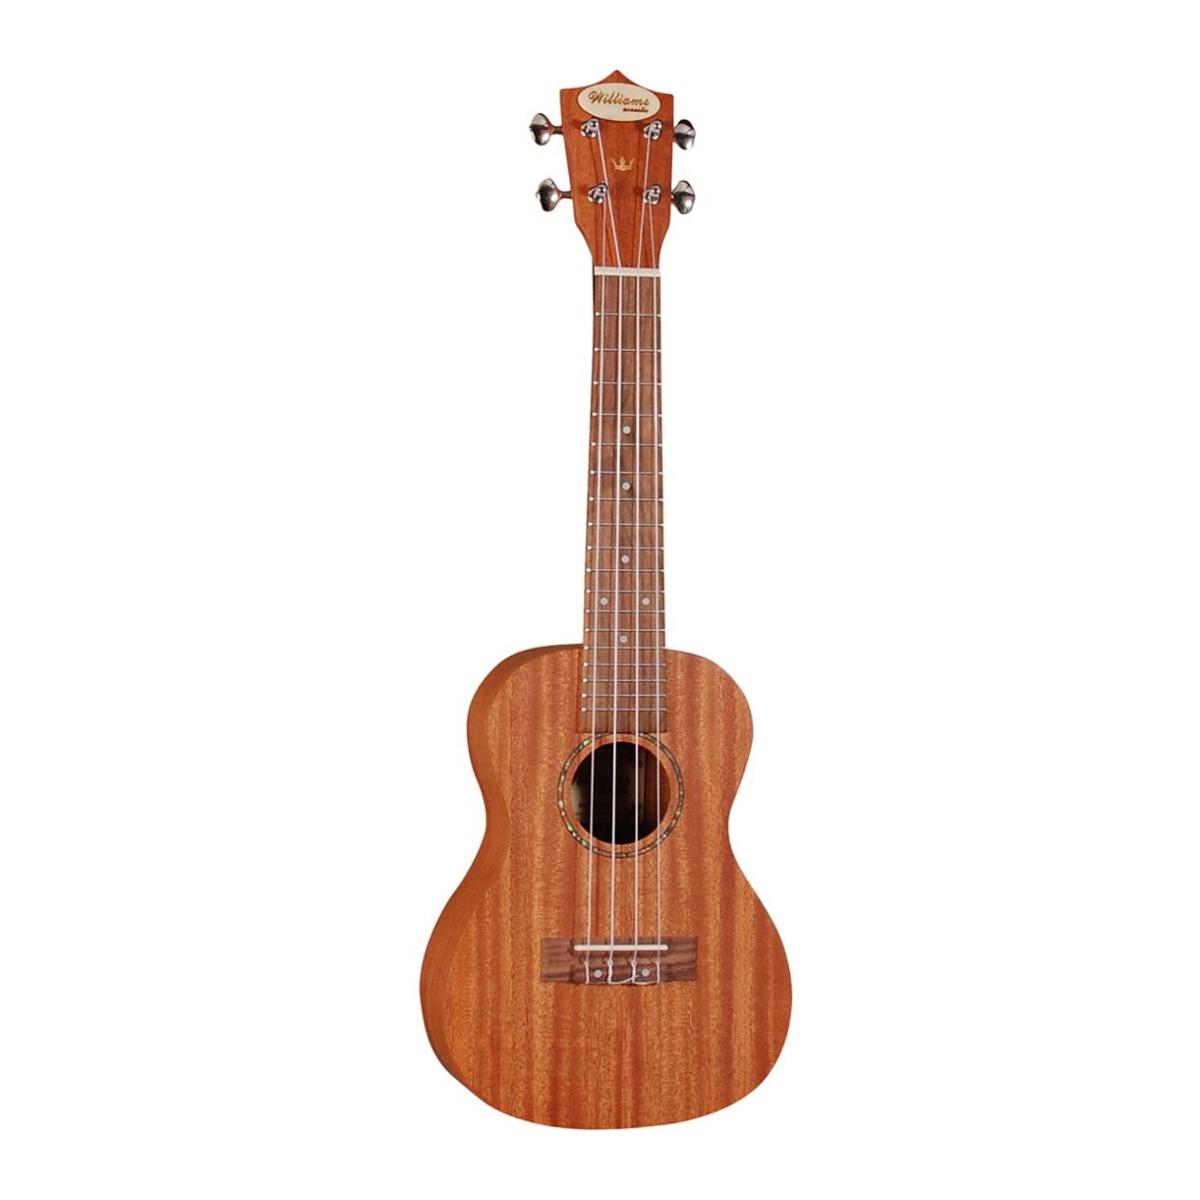 Williams Acoustic EU100C v2 concert ukulele